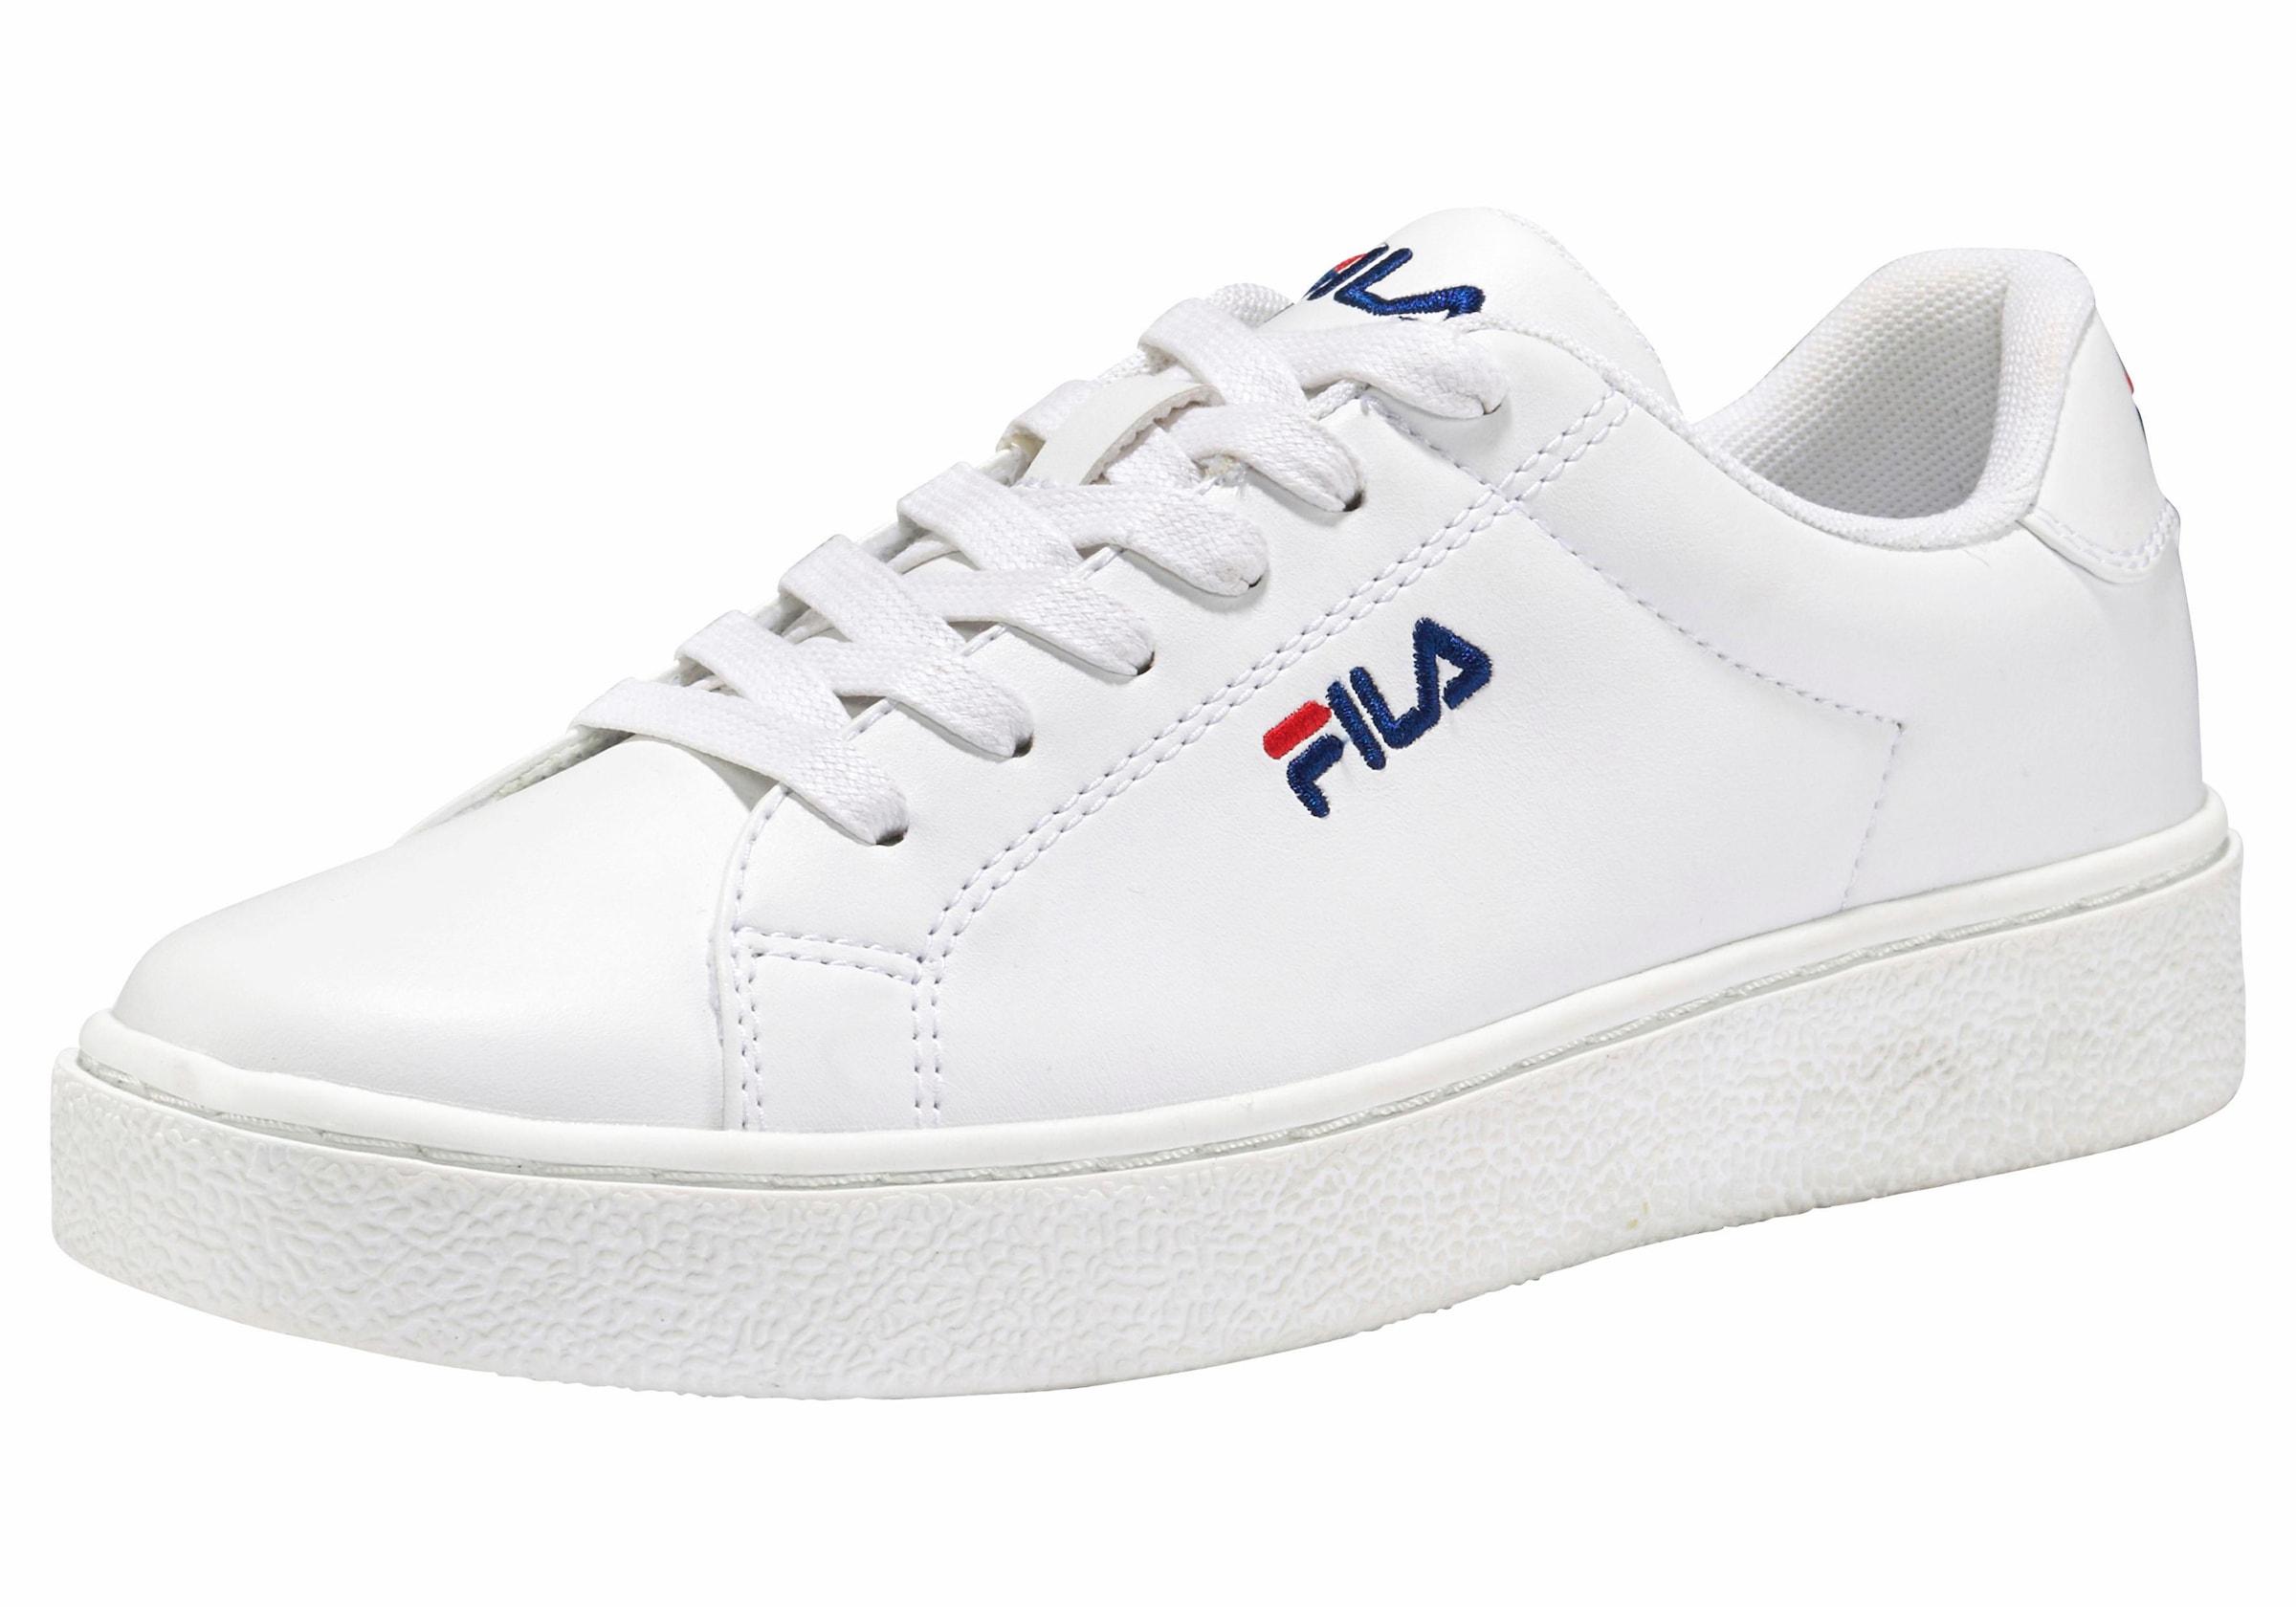 Fila Sneaker »Upstage Low Wmn« online kaufen | BAUR